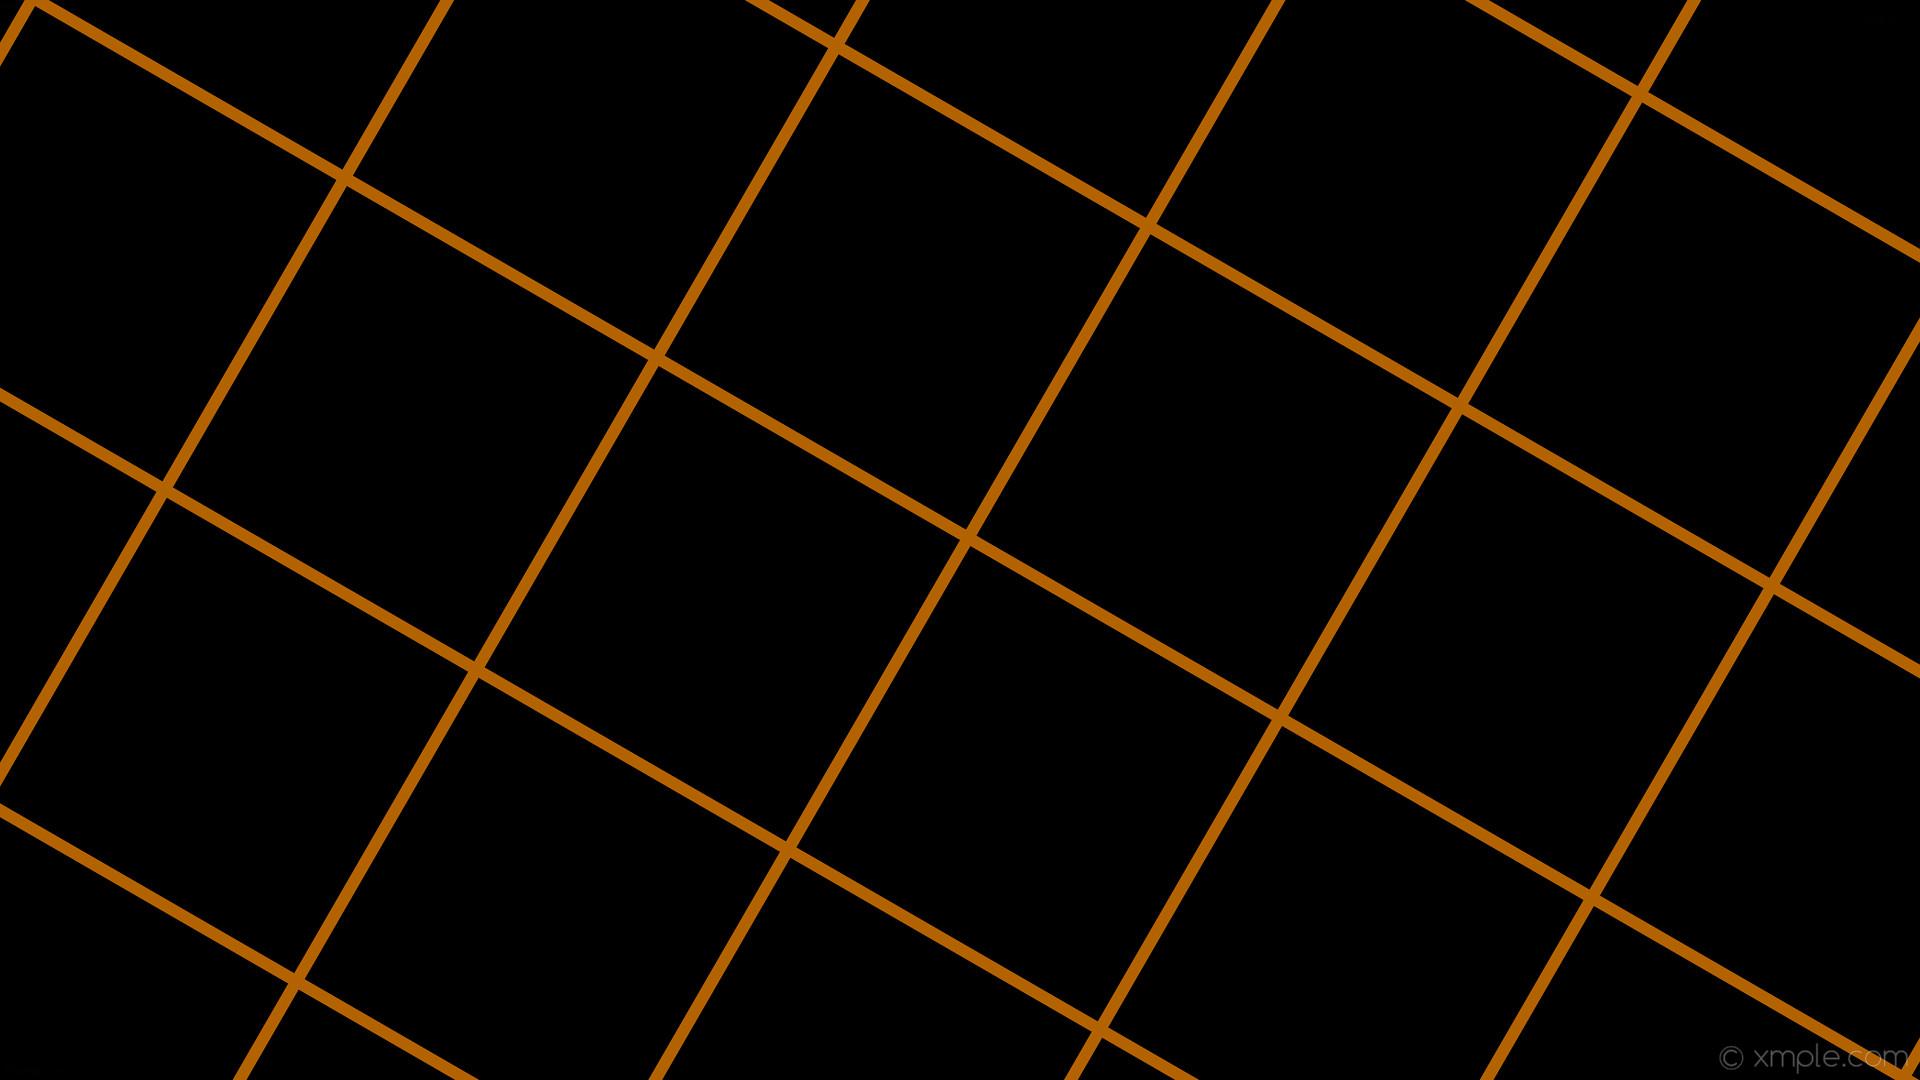 Res: 1920x1080, wallpaper graph paper orange black grid dark orange #000000 #ff8c00 60°  12px 360px